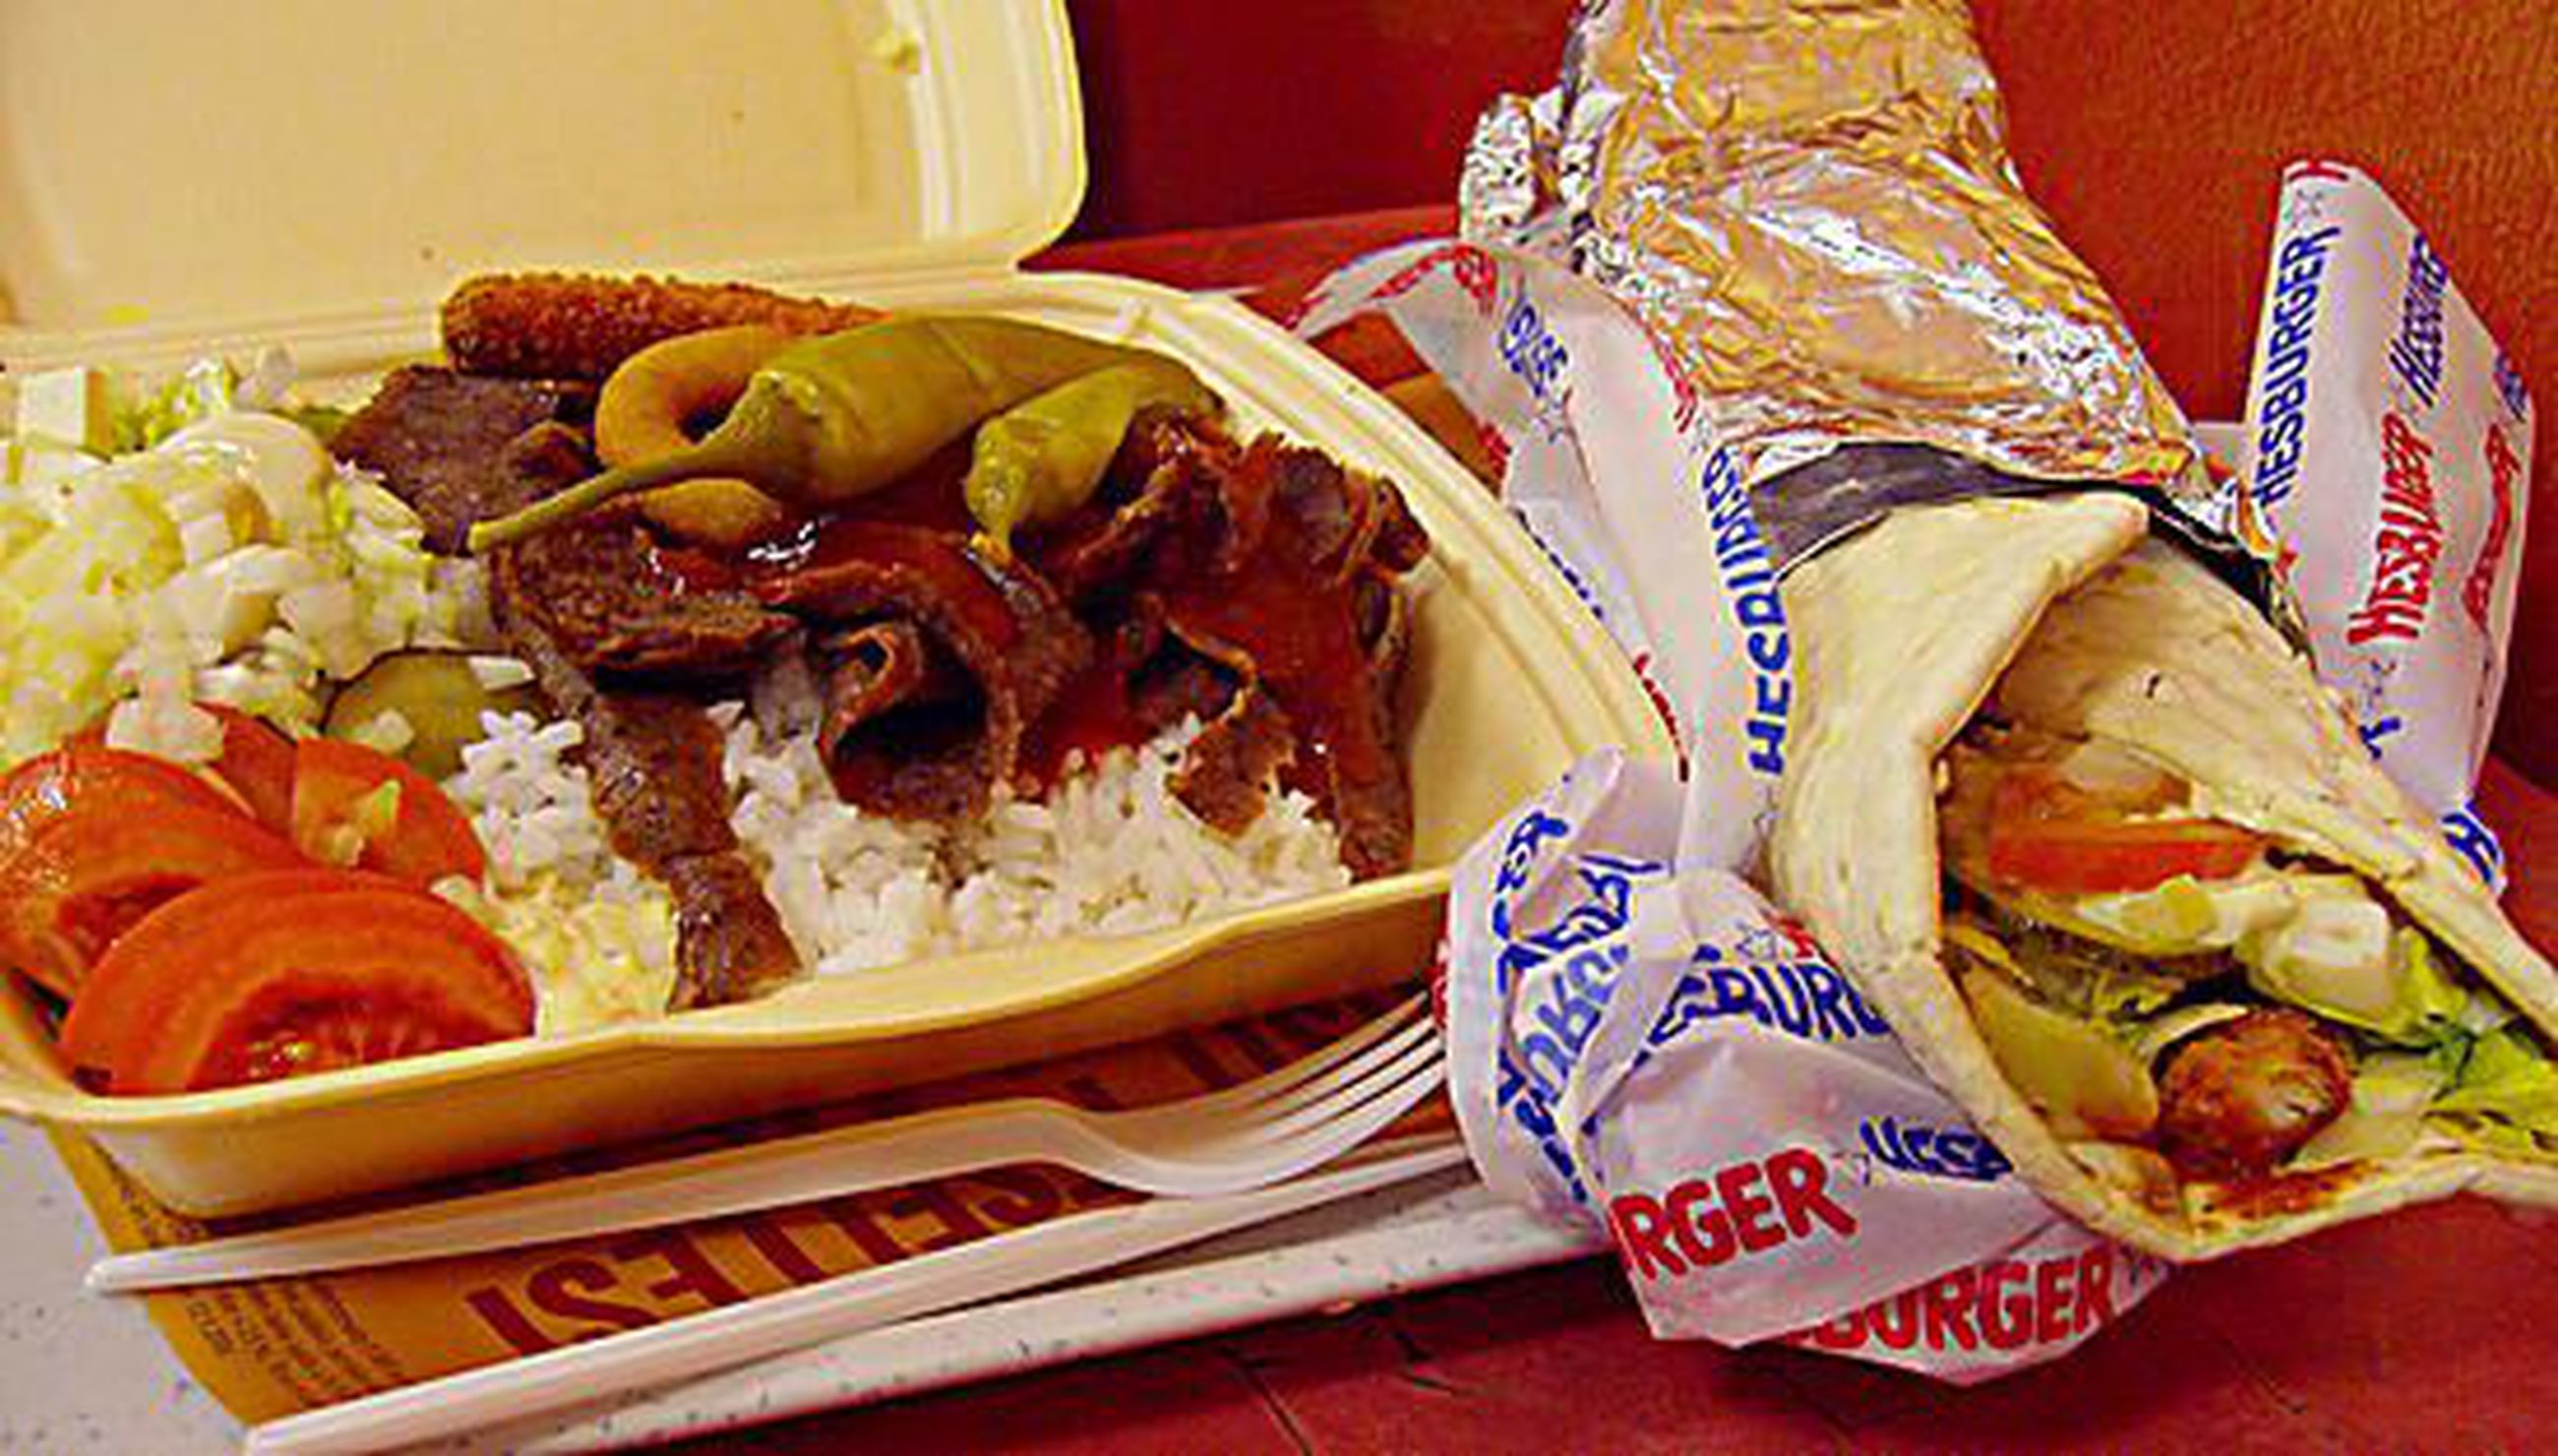 Hese Kebab